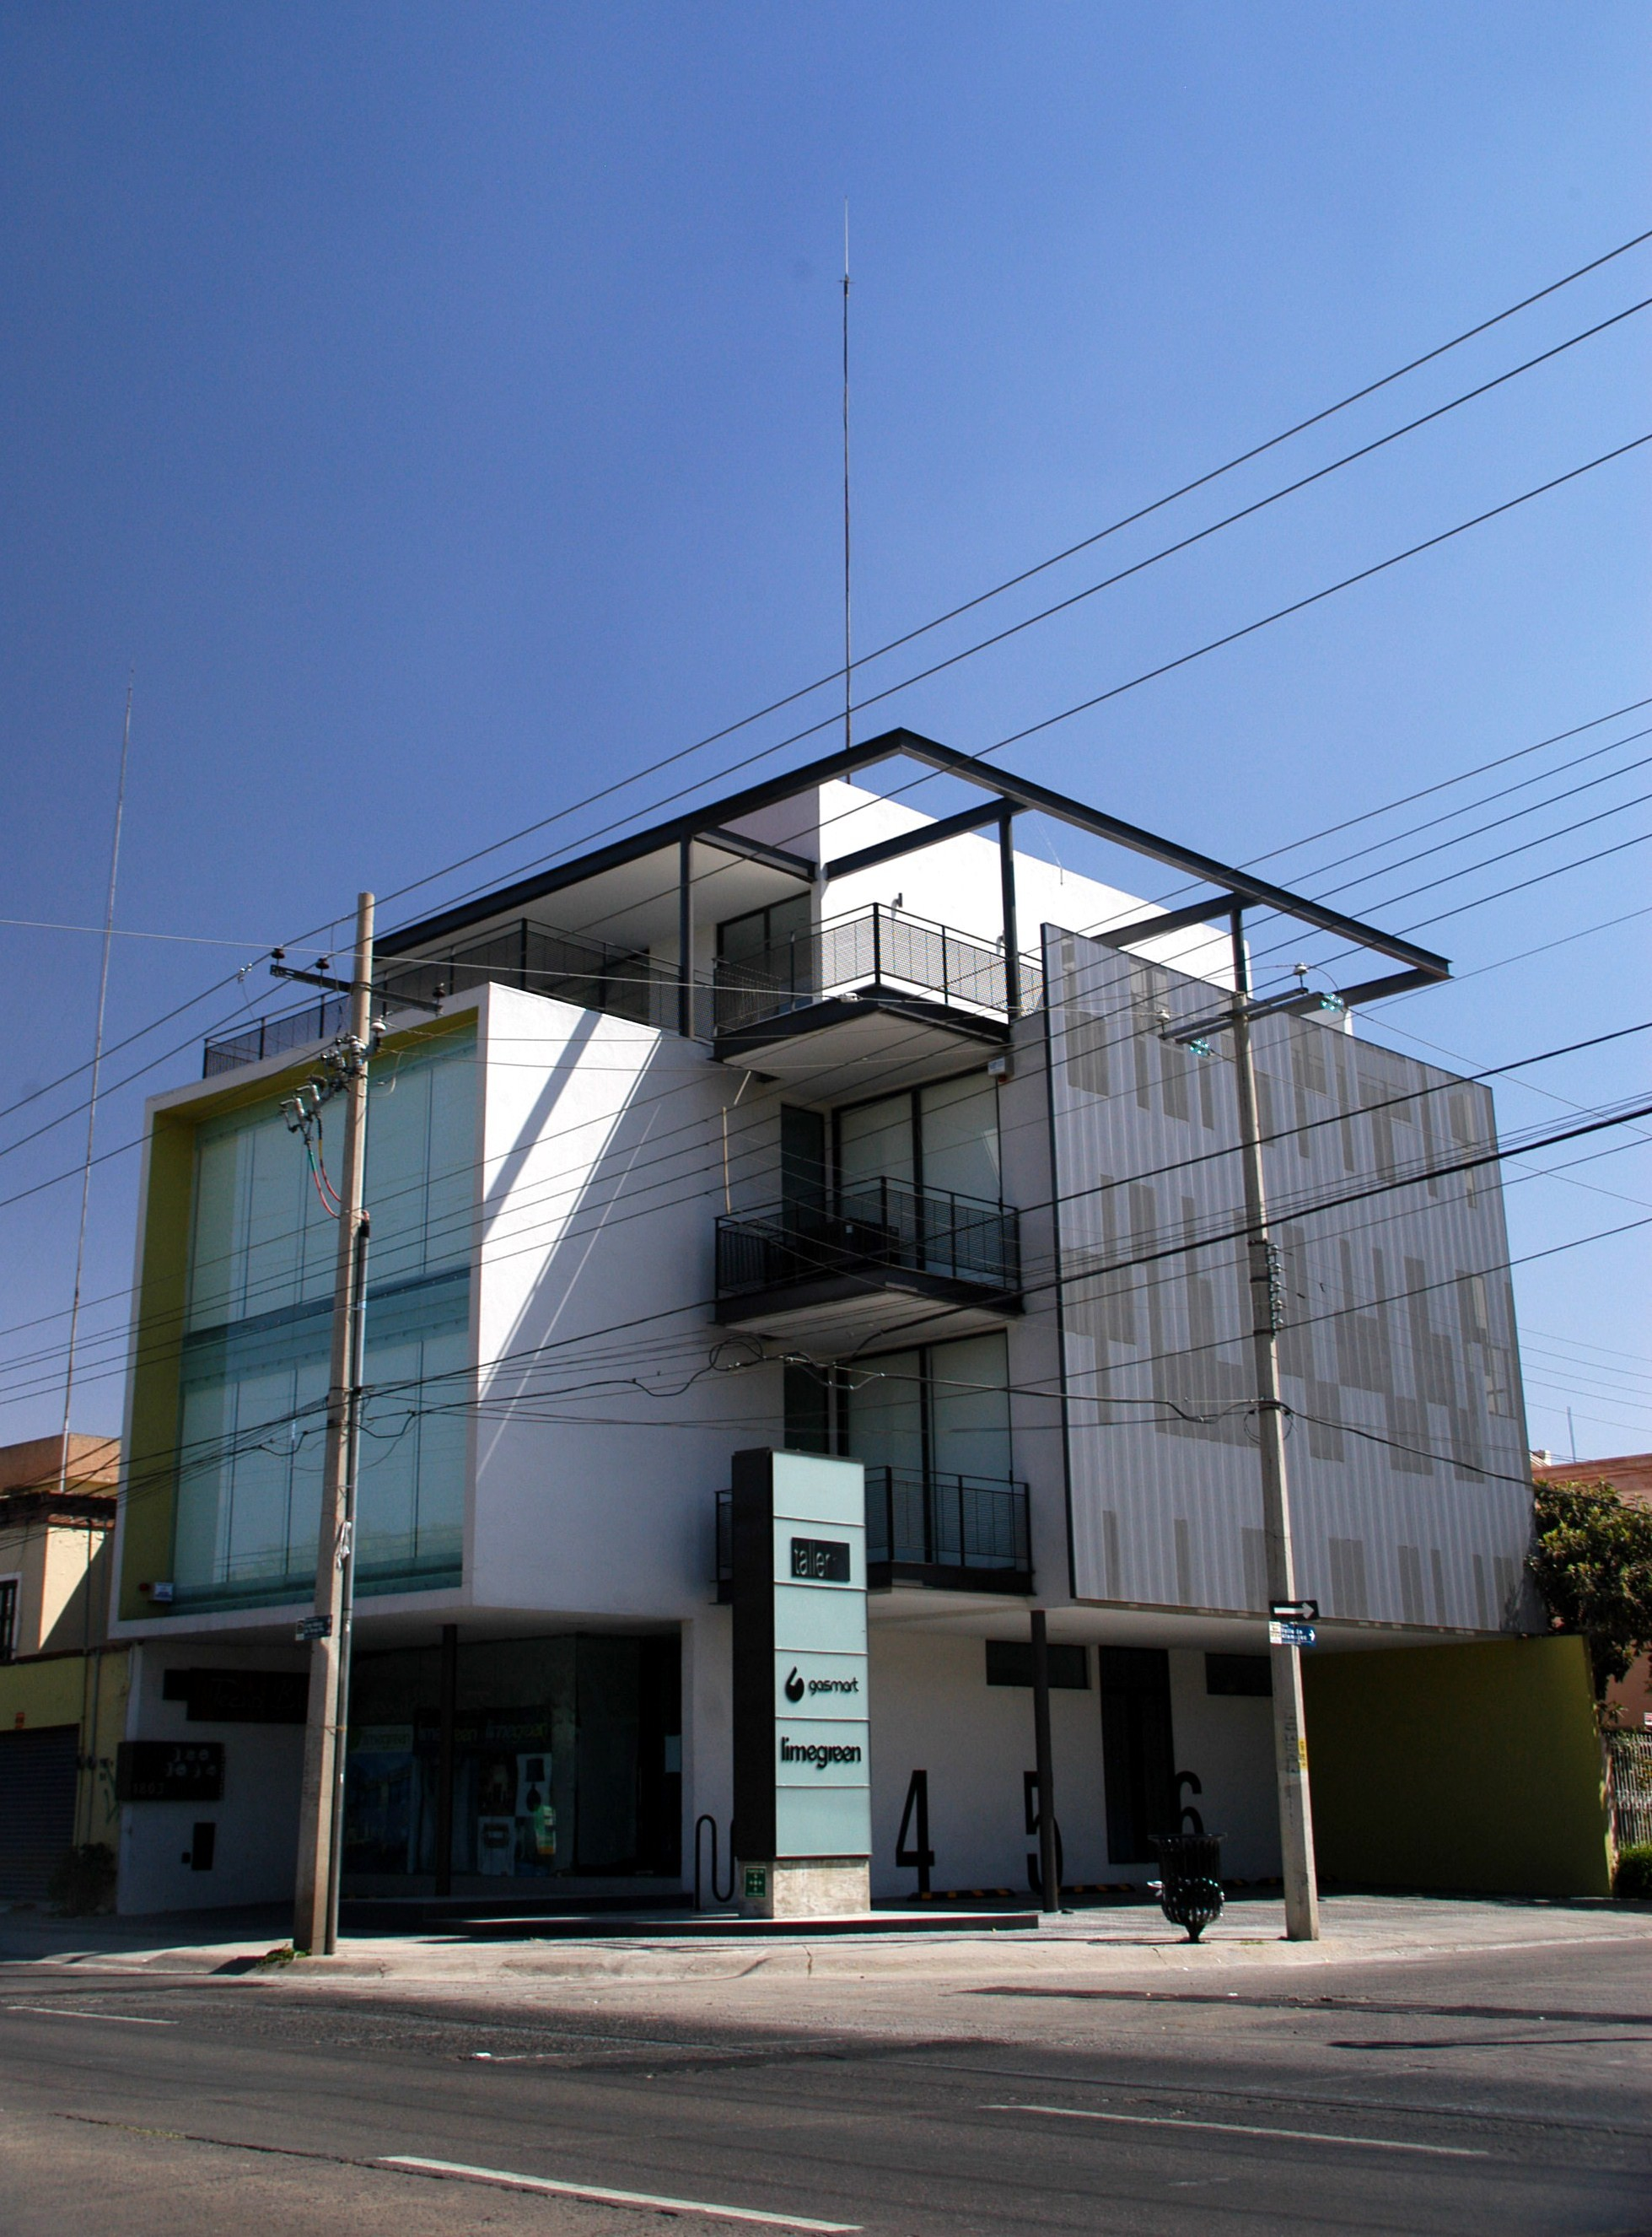 Edificio Atemajac / Taller 5 Arquitectura, © José Calleros